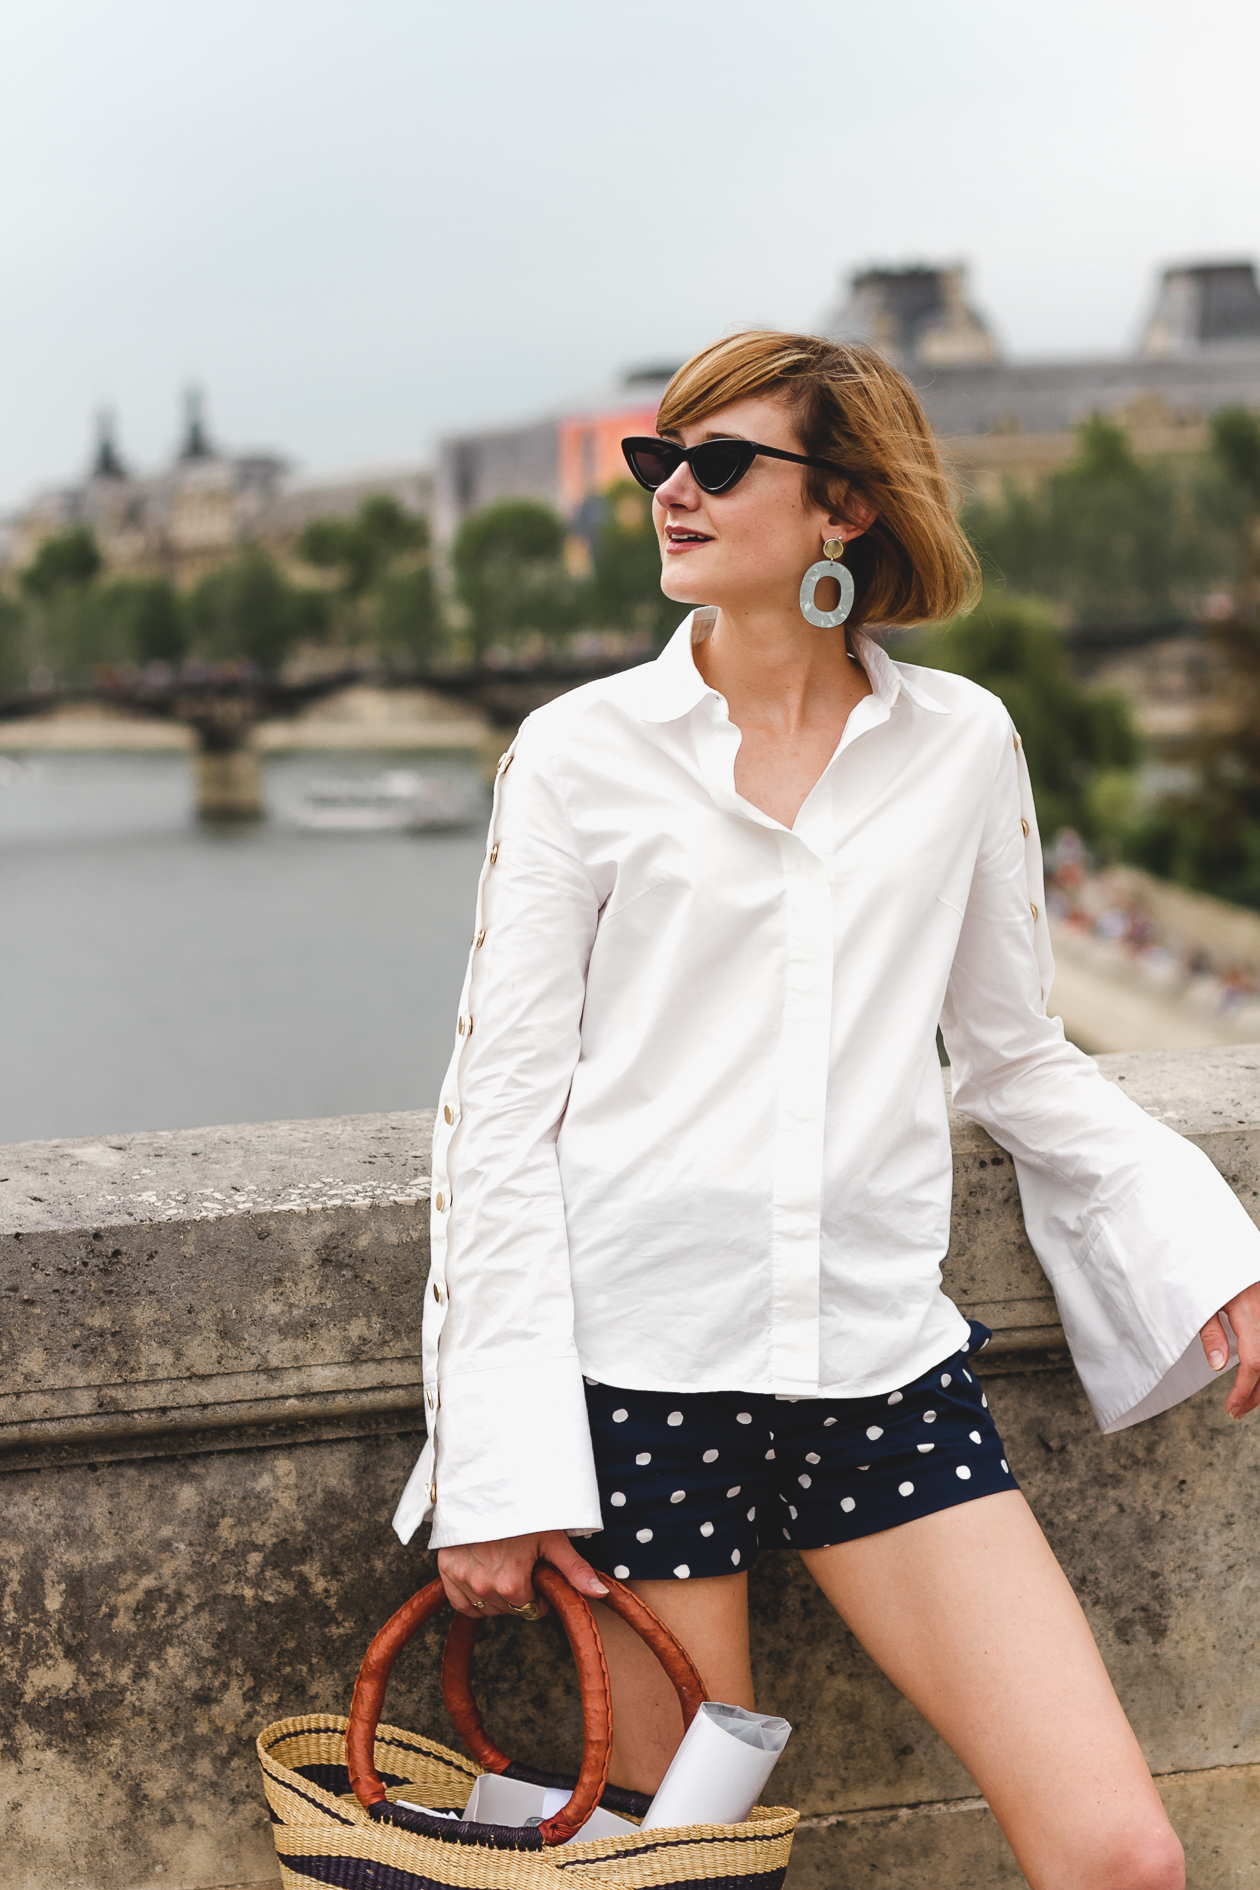 Pixie Market button-down and polka dot shorts